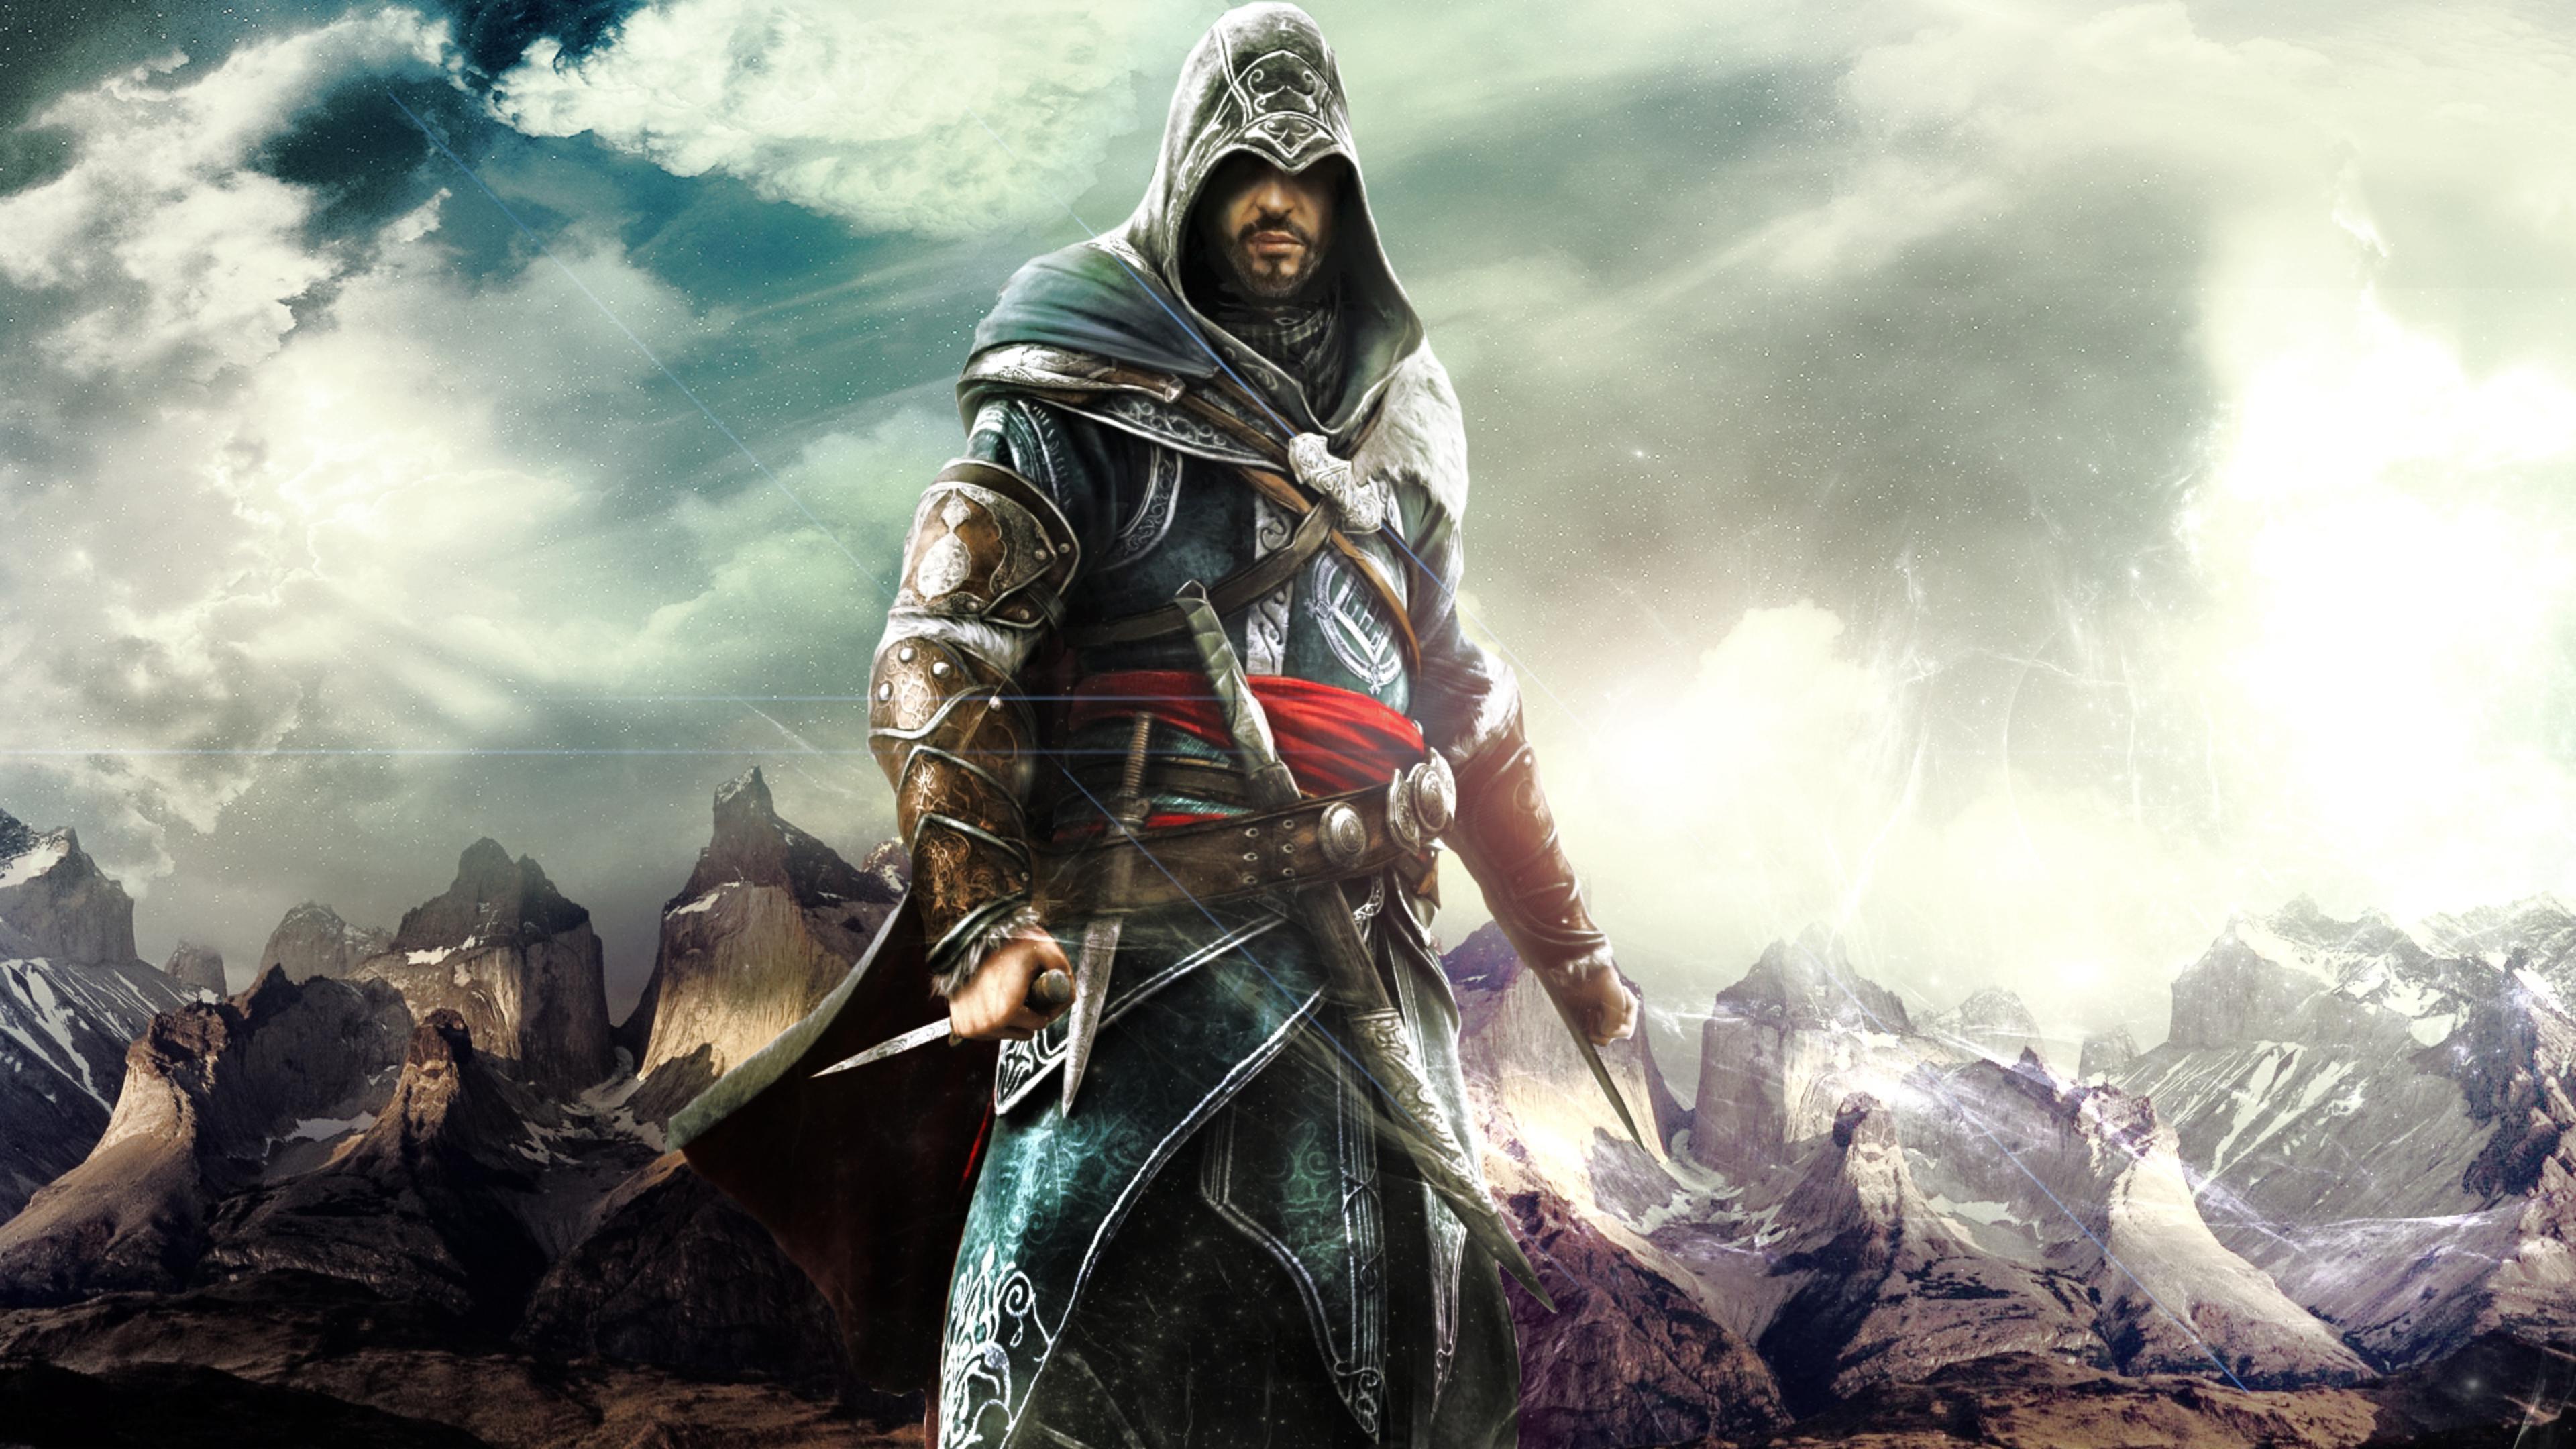 Assassins Creed 4k Wallpaper